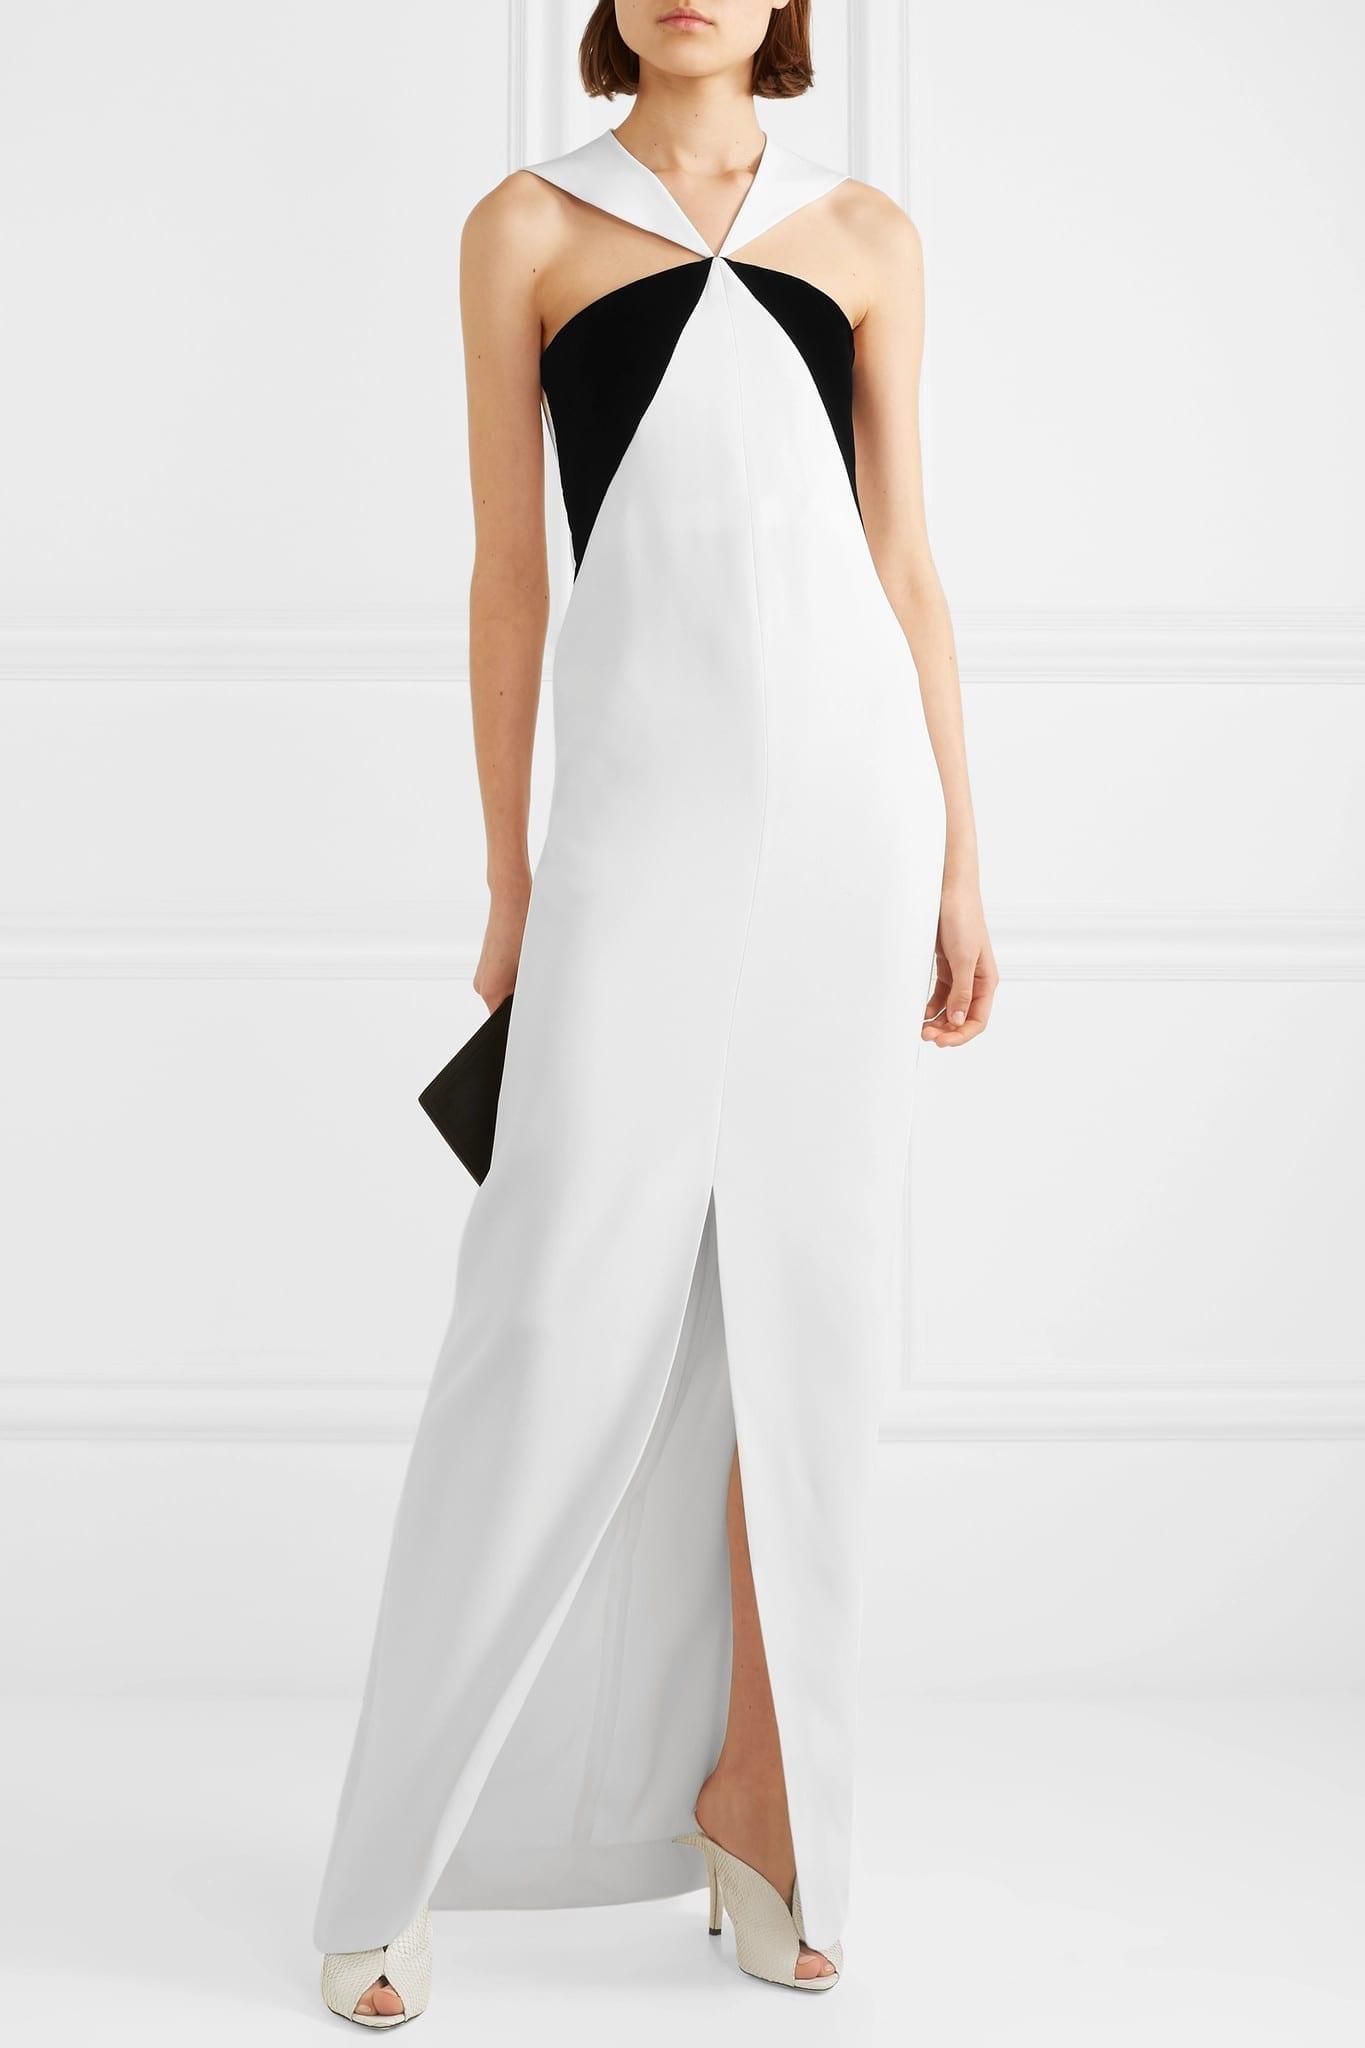 GIVENCHY Velvet-paneled Crepe Halterneck Gown